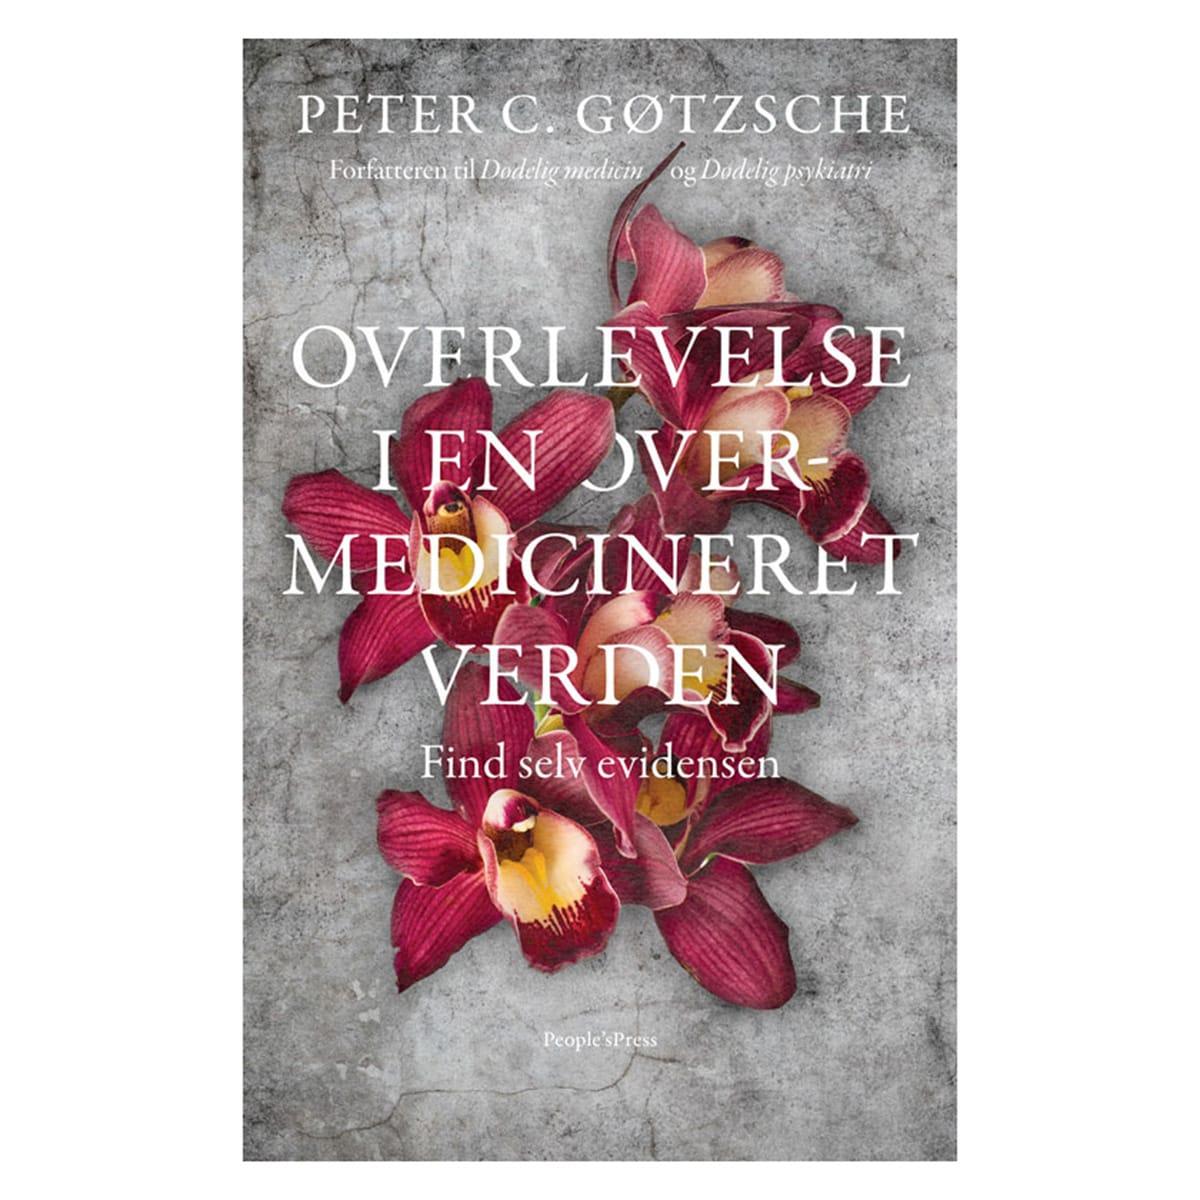 Af Peter C. Gøtzsche